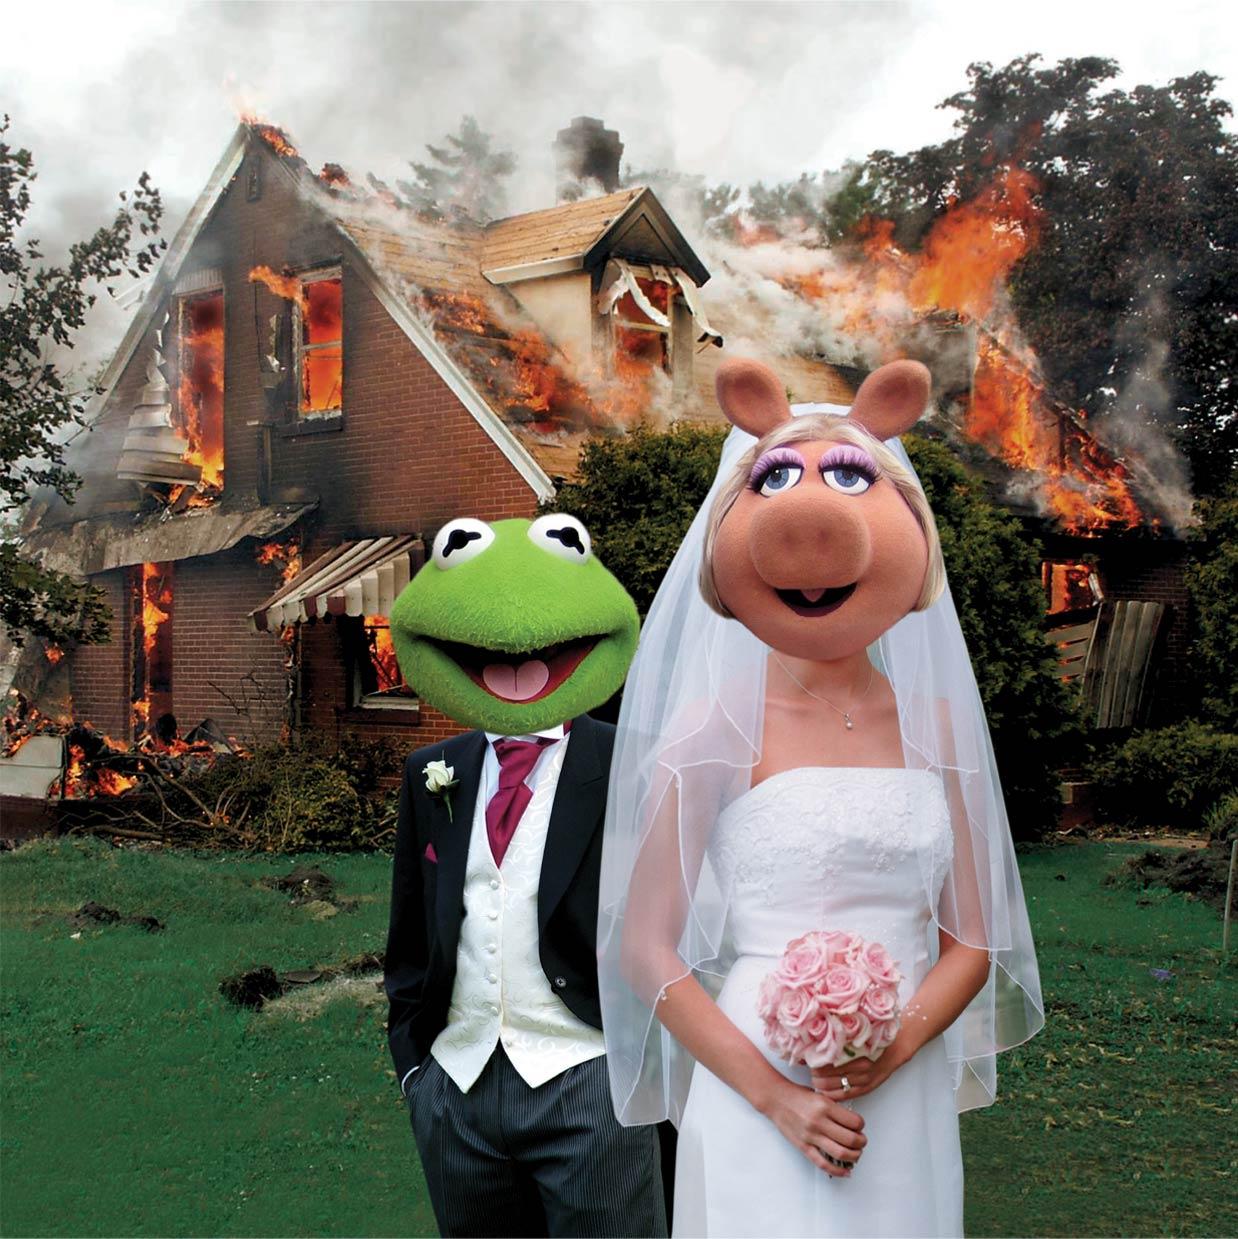 American Wedding N. 1 - Max Papeschi